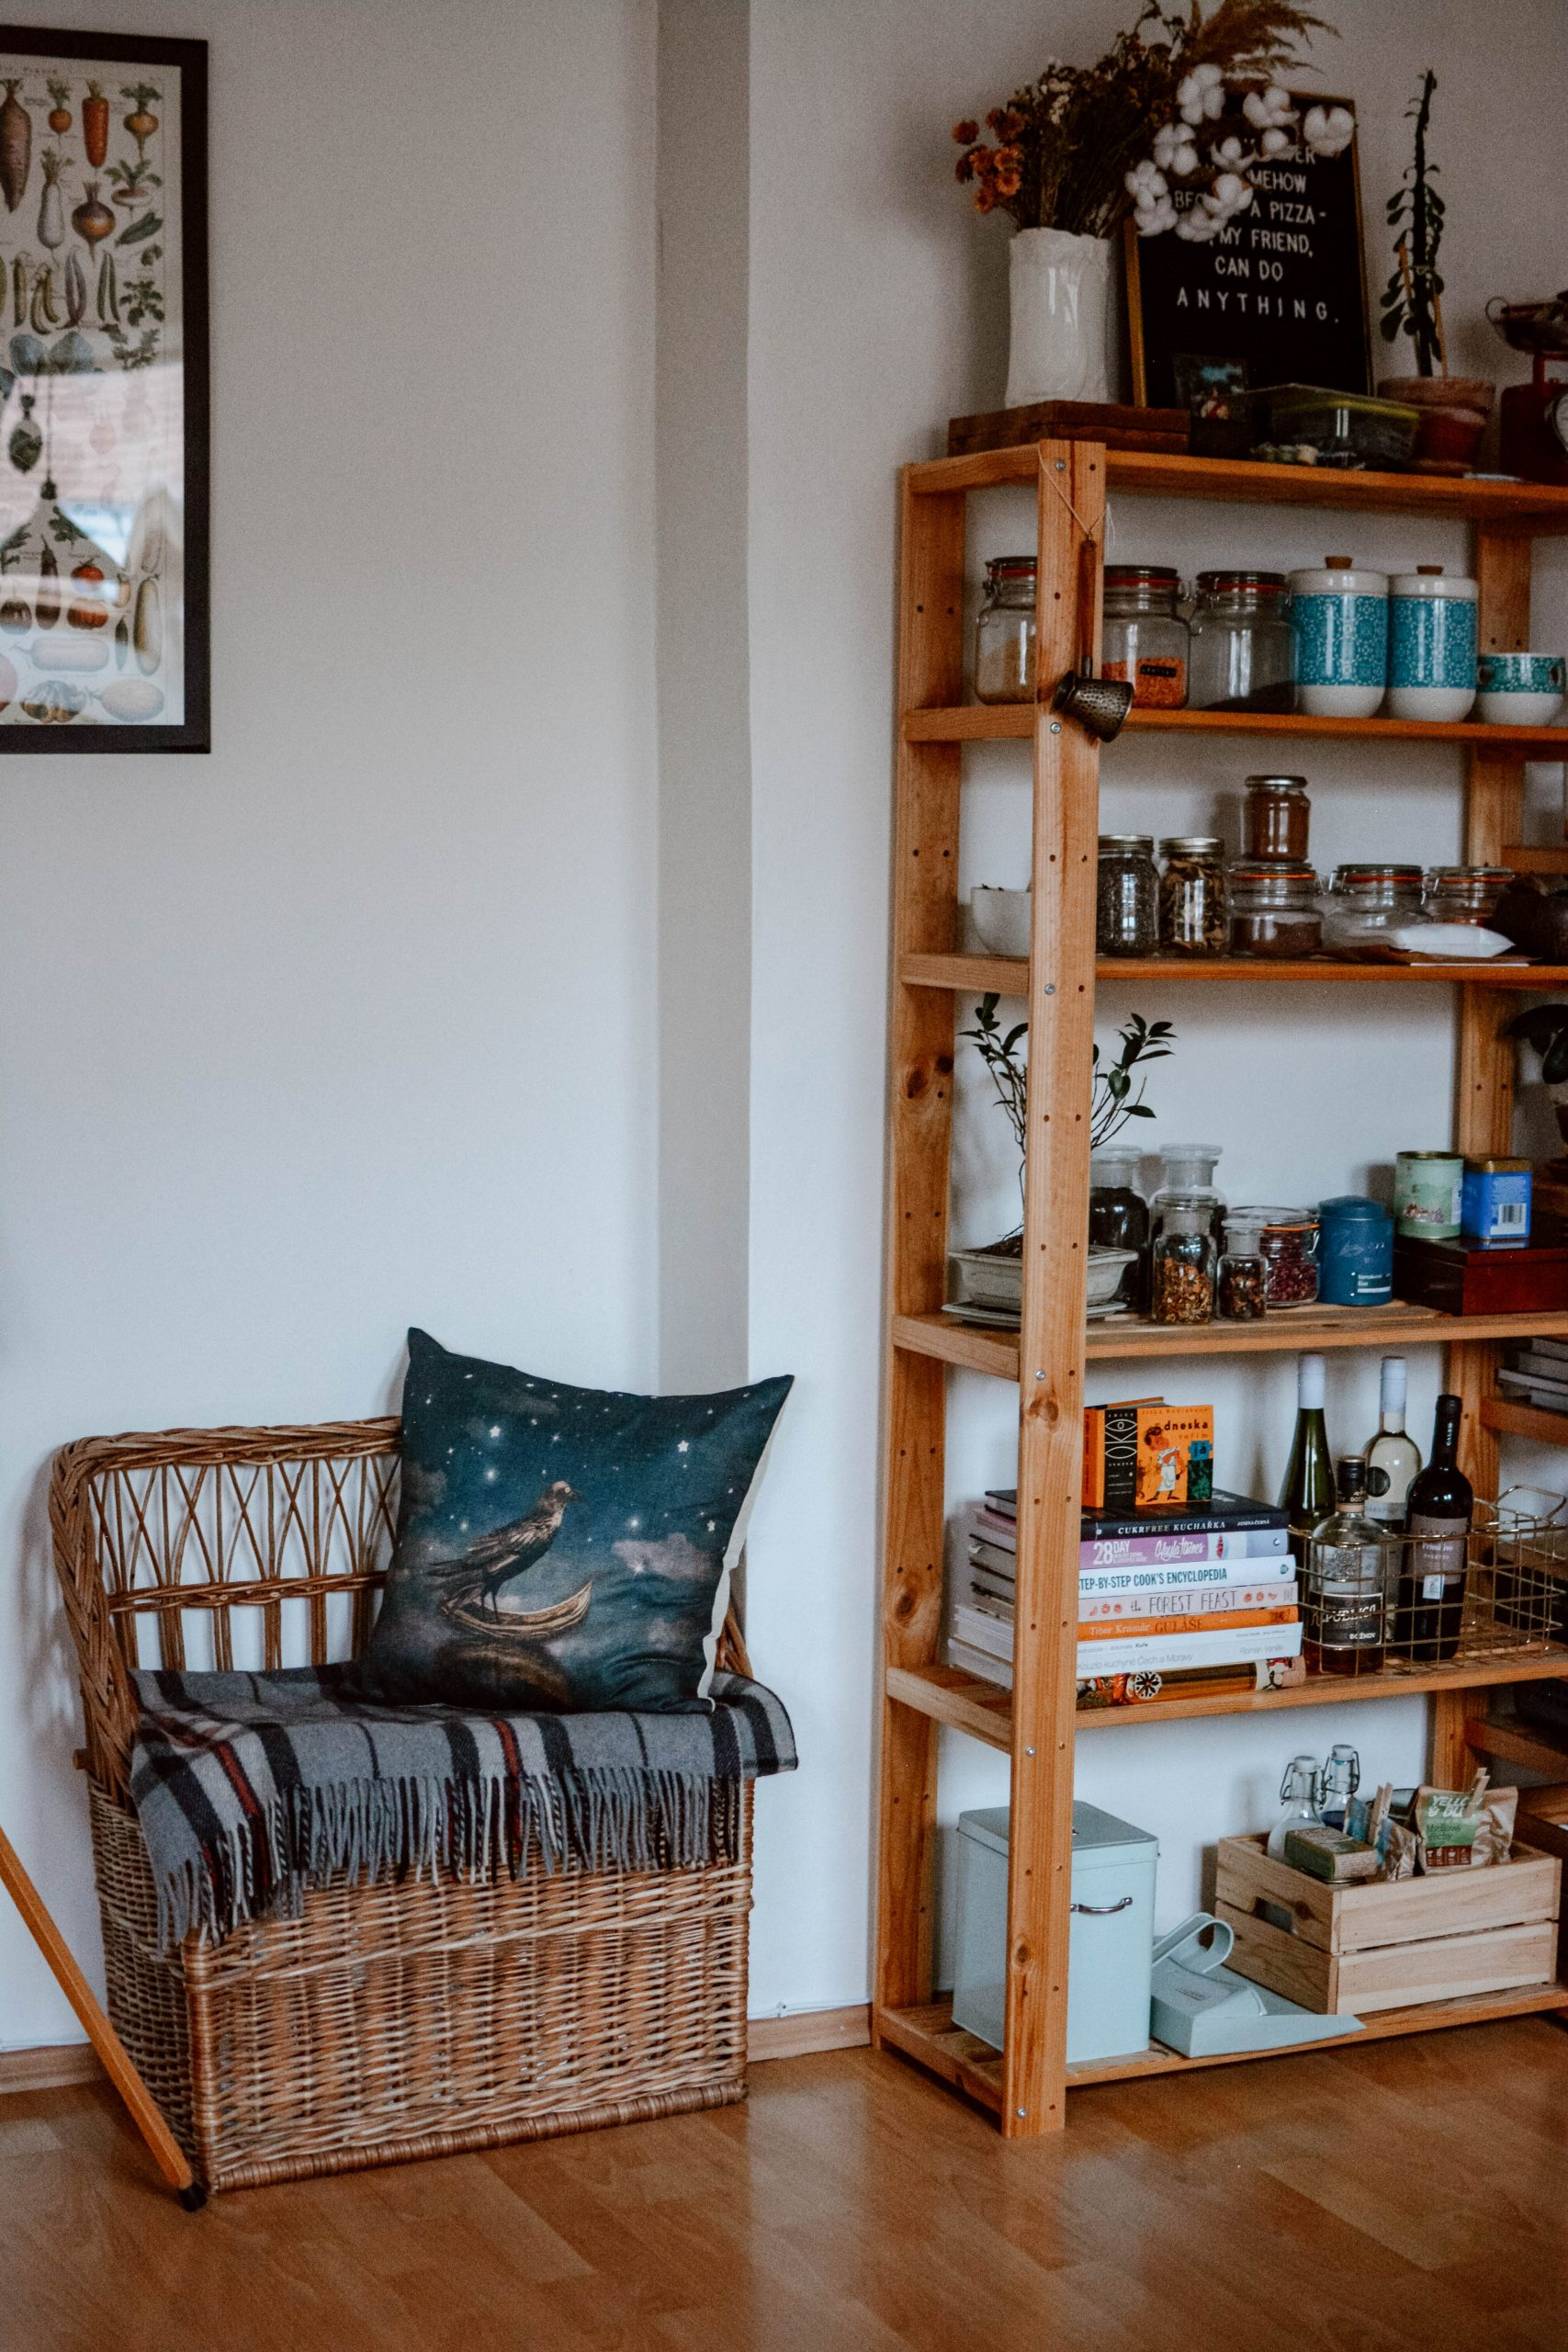 How to create a home you adore